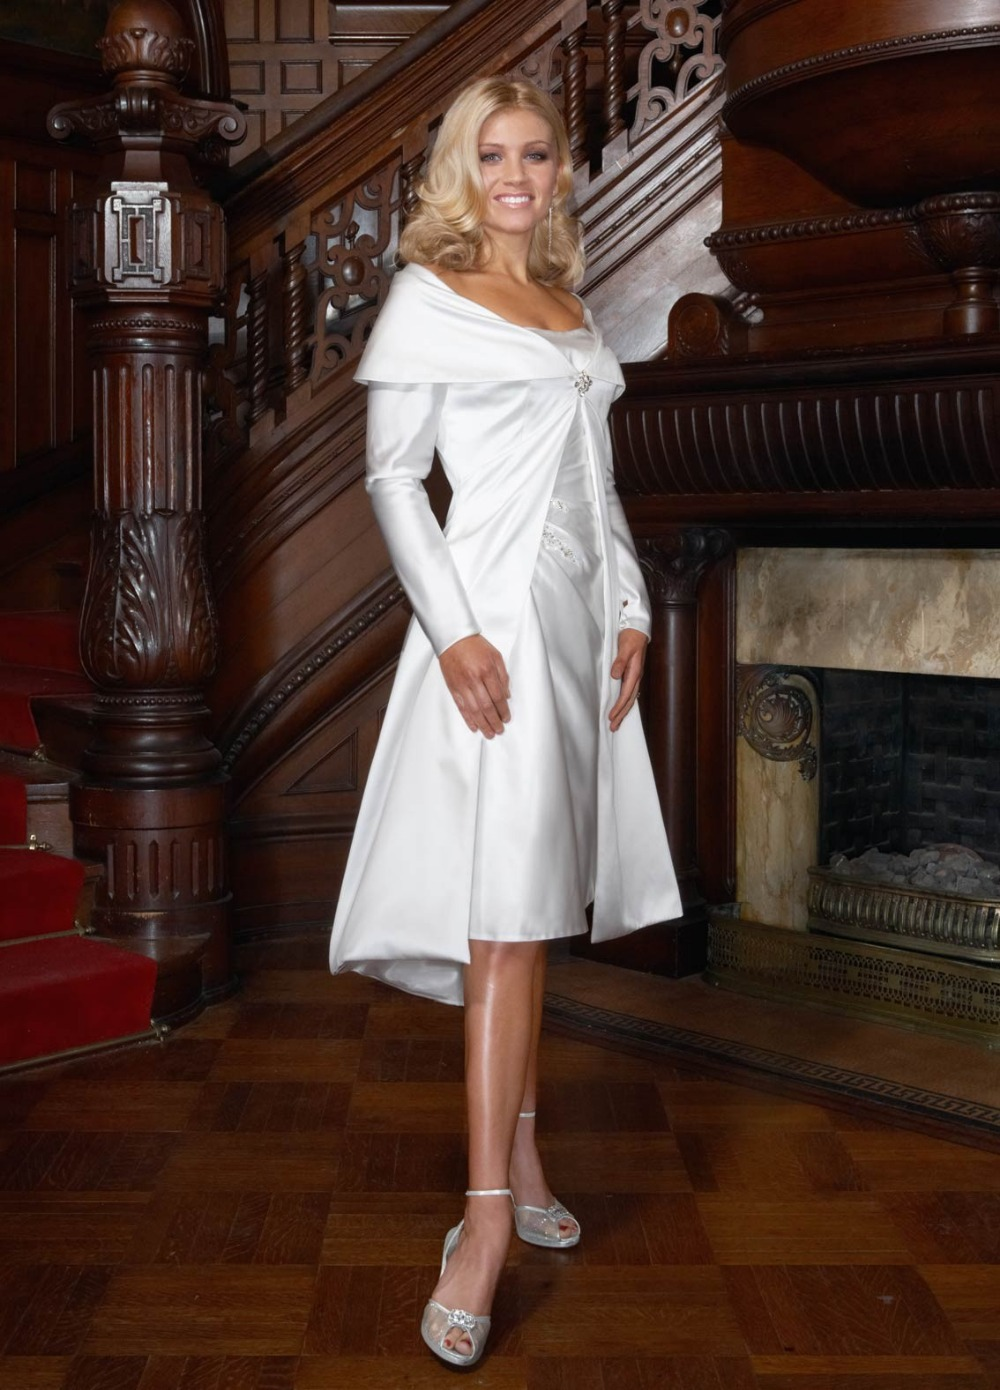 list detail short vintage wedding dresses with sleeves short wedding dresses cheap Zoom Aliexpress com Buy Cap sleeve knee length short wedding dresses